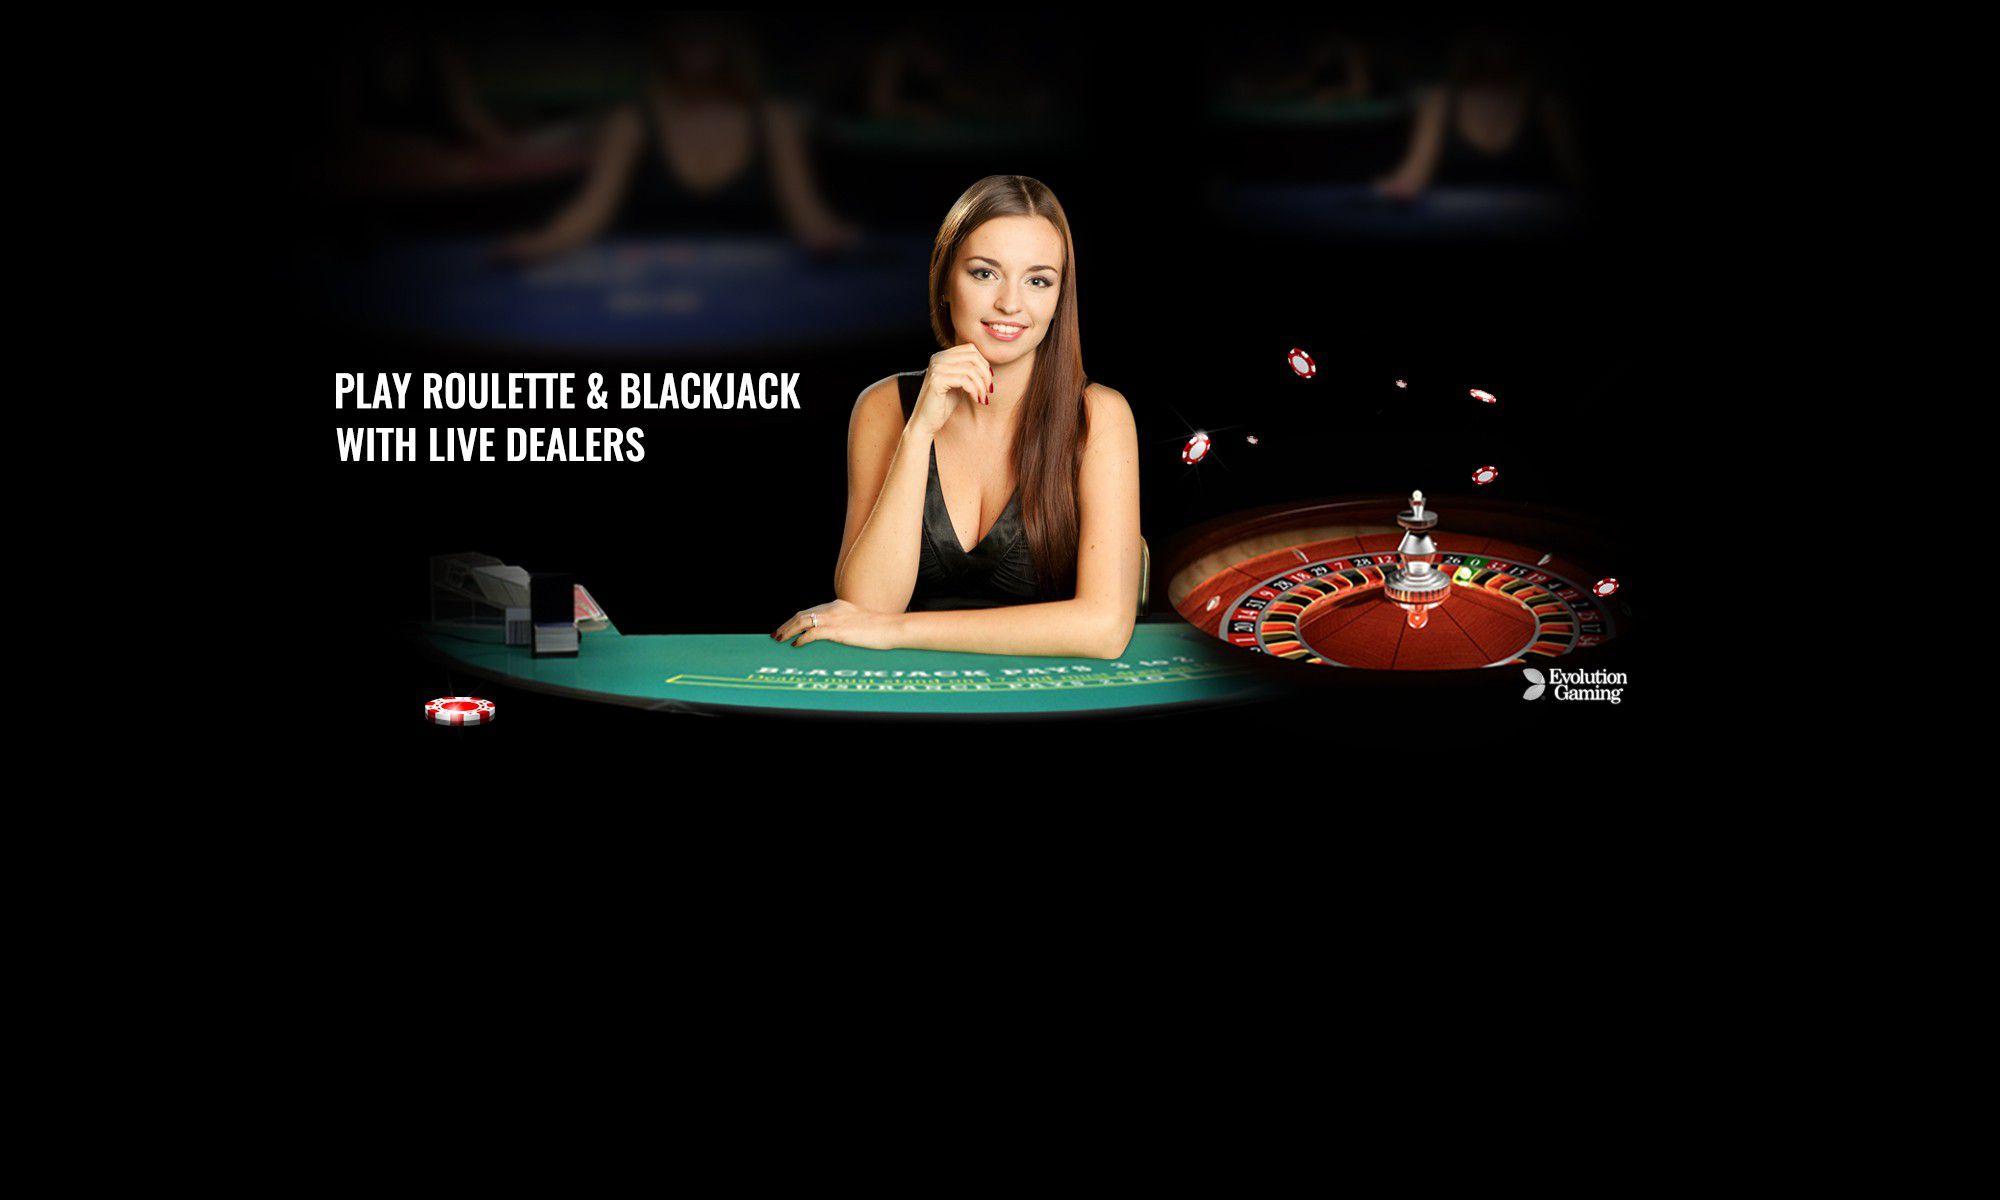 Flash citadel casino harrahs casino atlantic city poker room